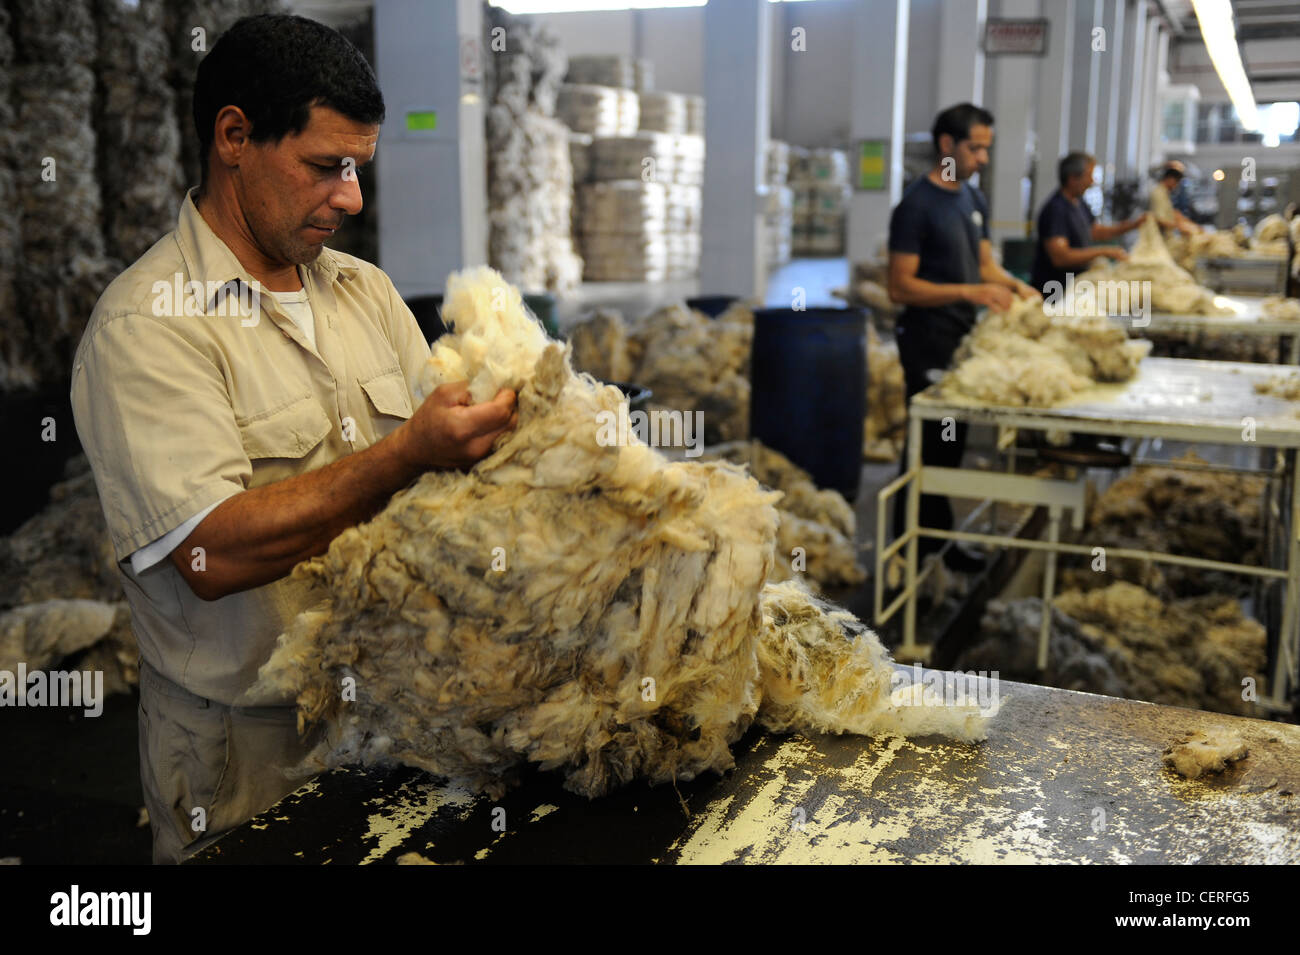 URUGUAY city Trinidad, company Lanas Trinidad S.A. processing and spinning of Merino sheep wool Stock Photo